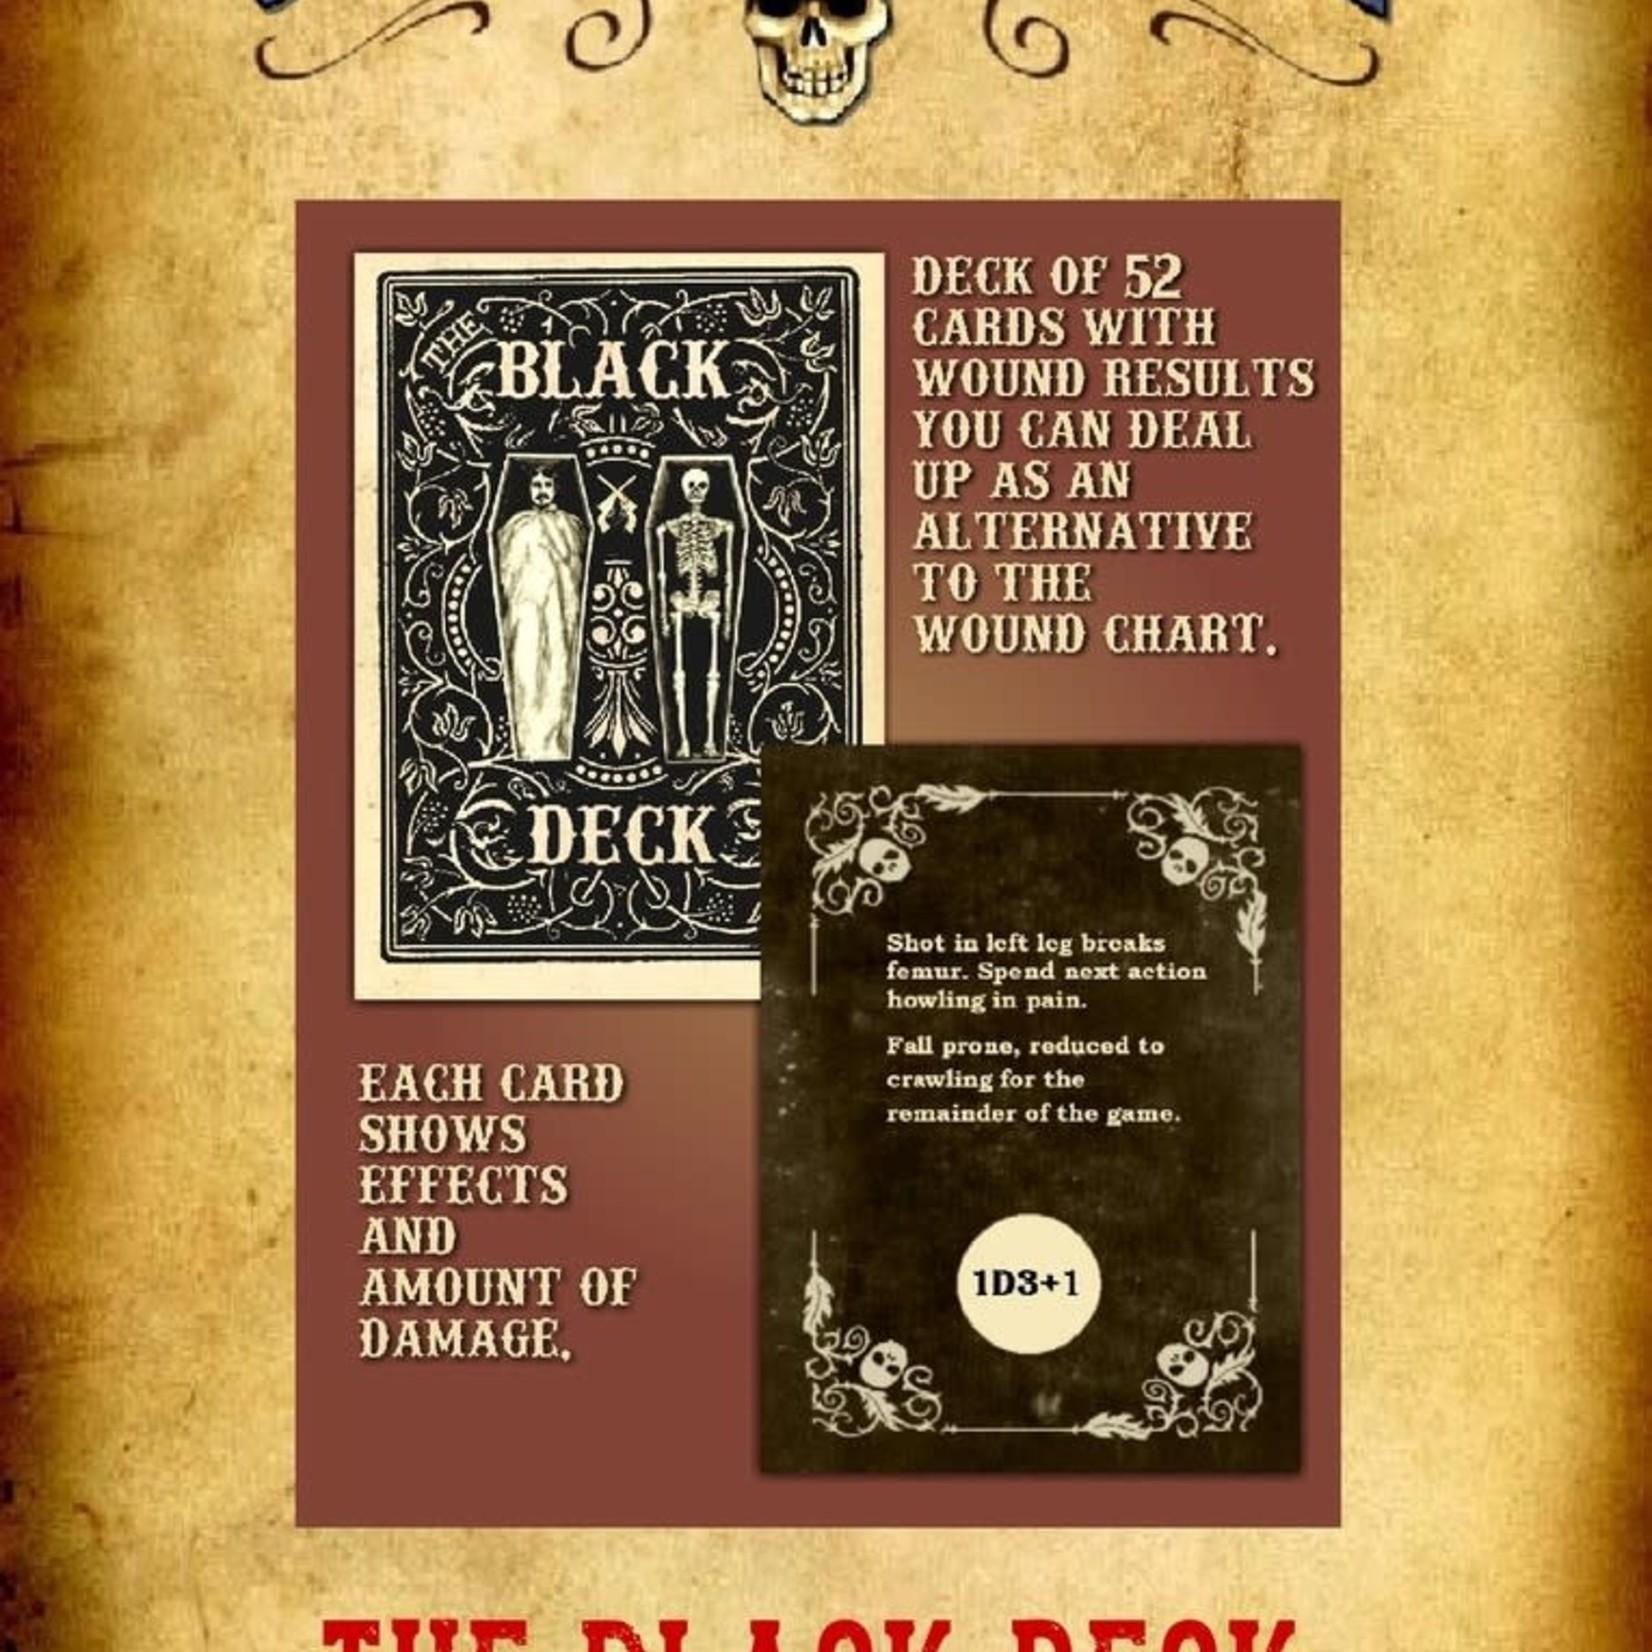 The Black Deck